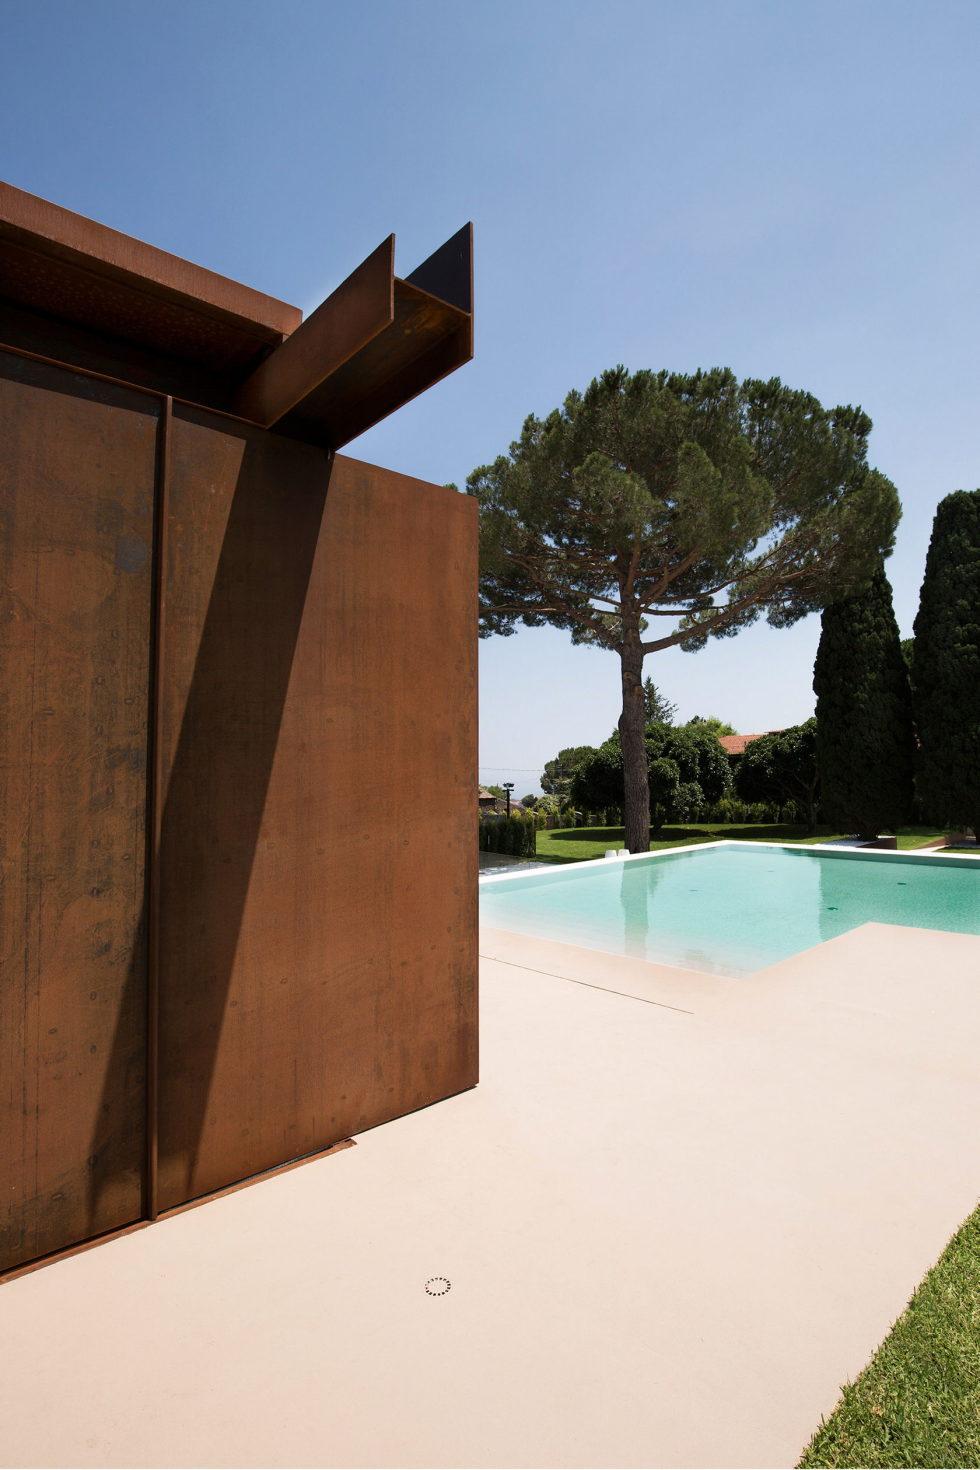 CRV Villa In Italy From ACA Amore Campione Architettura 4